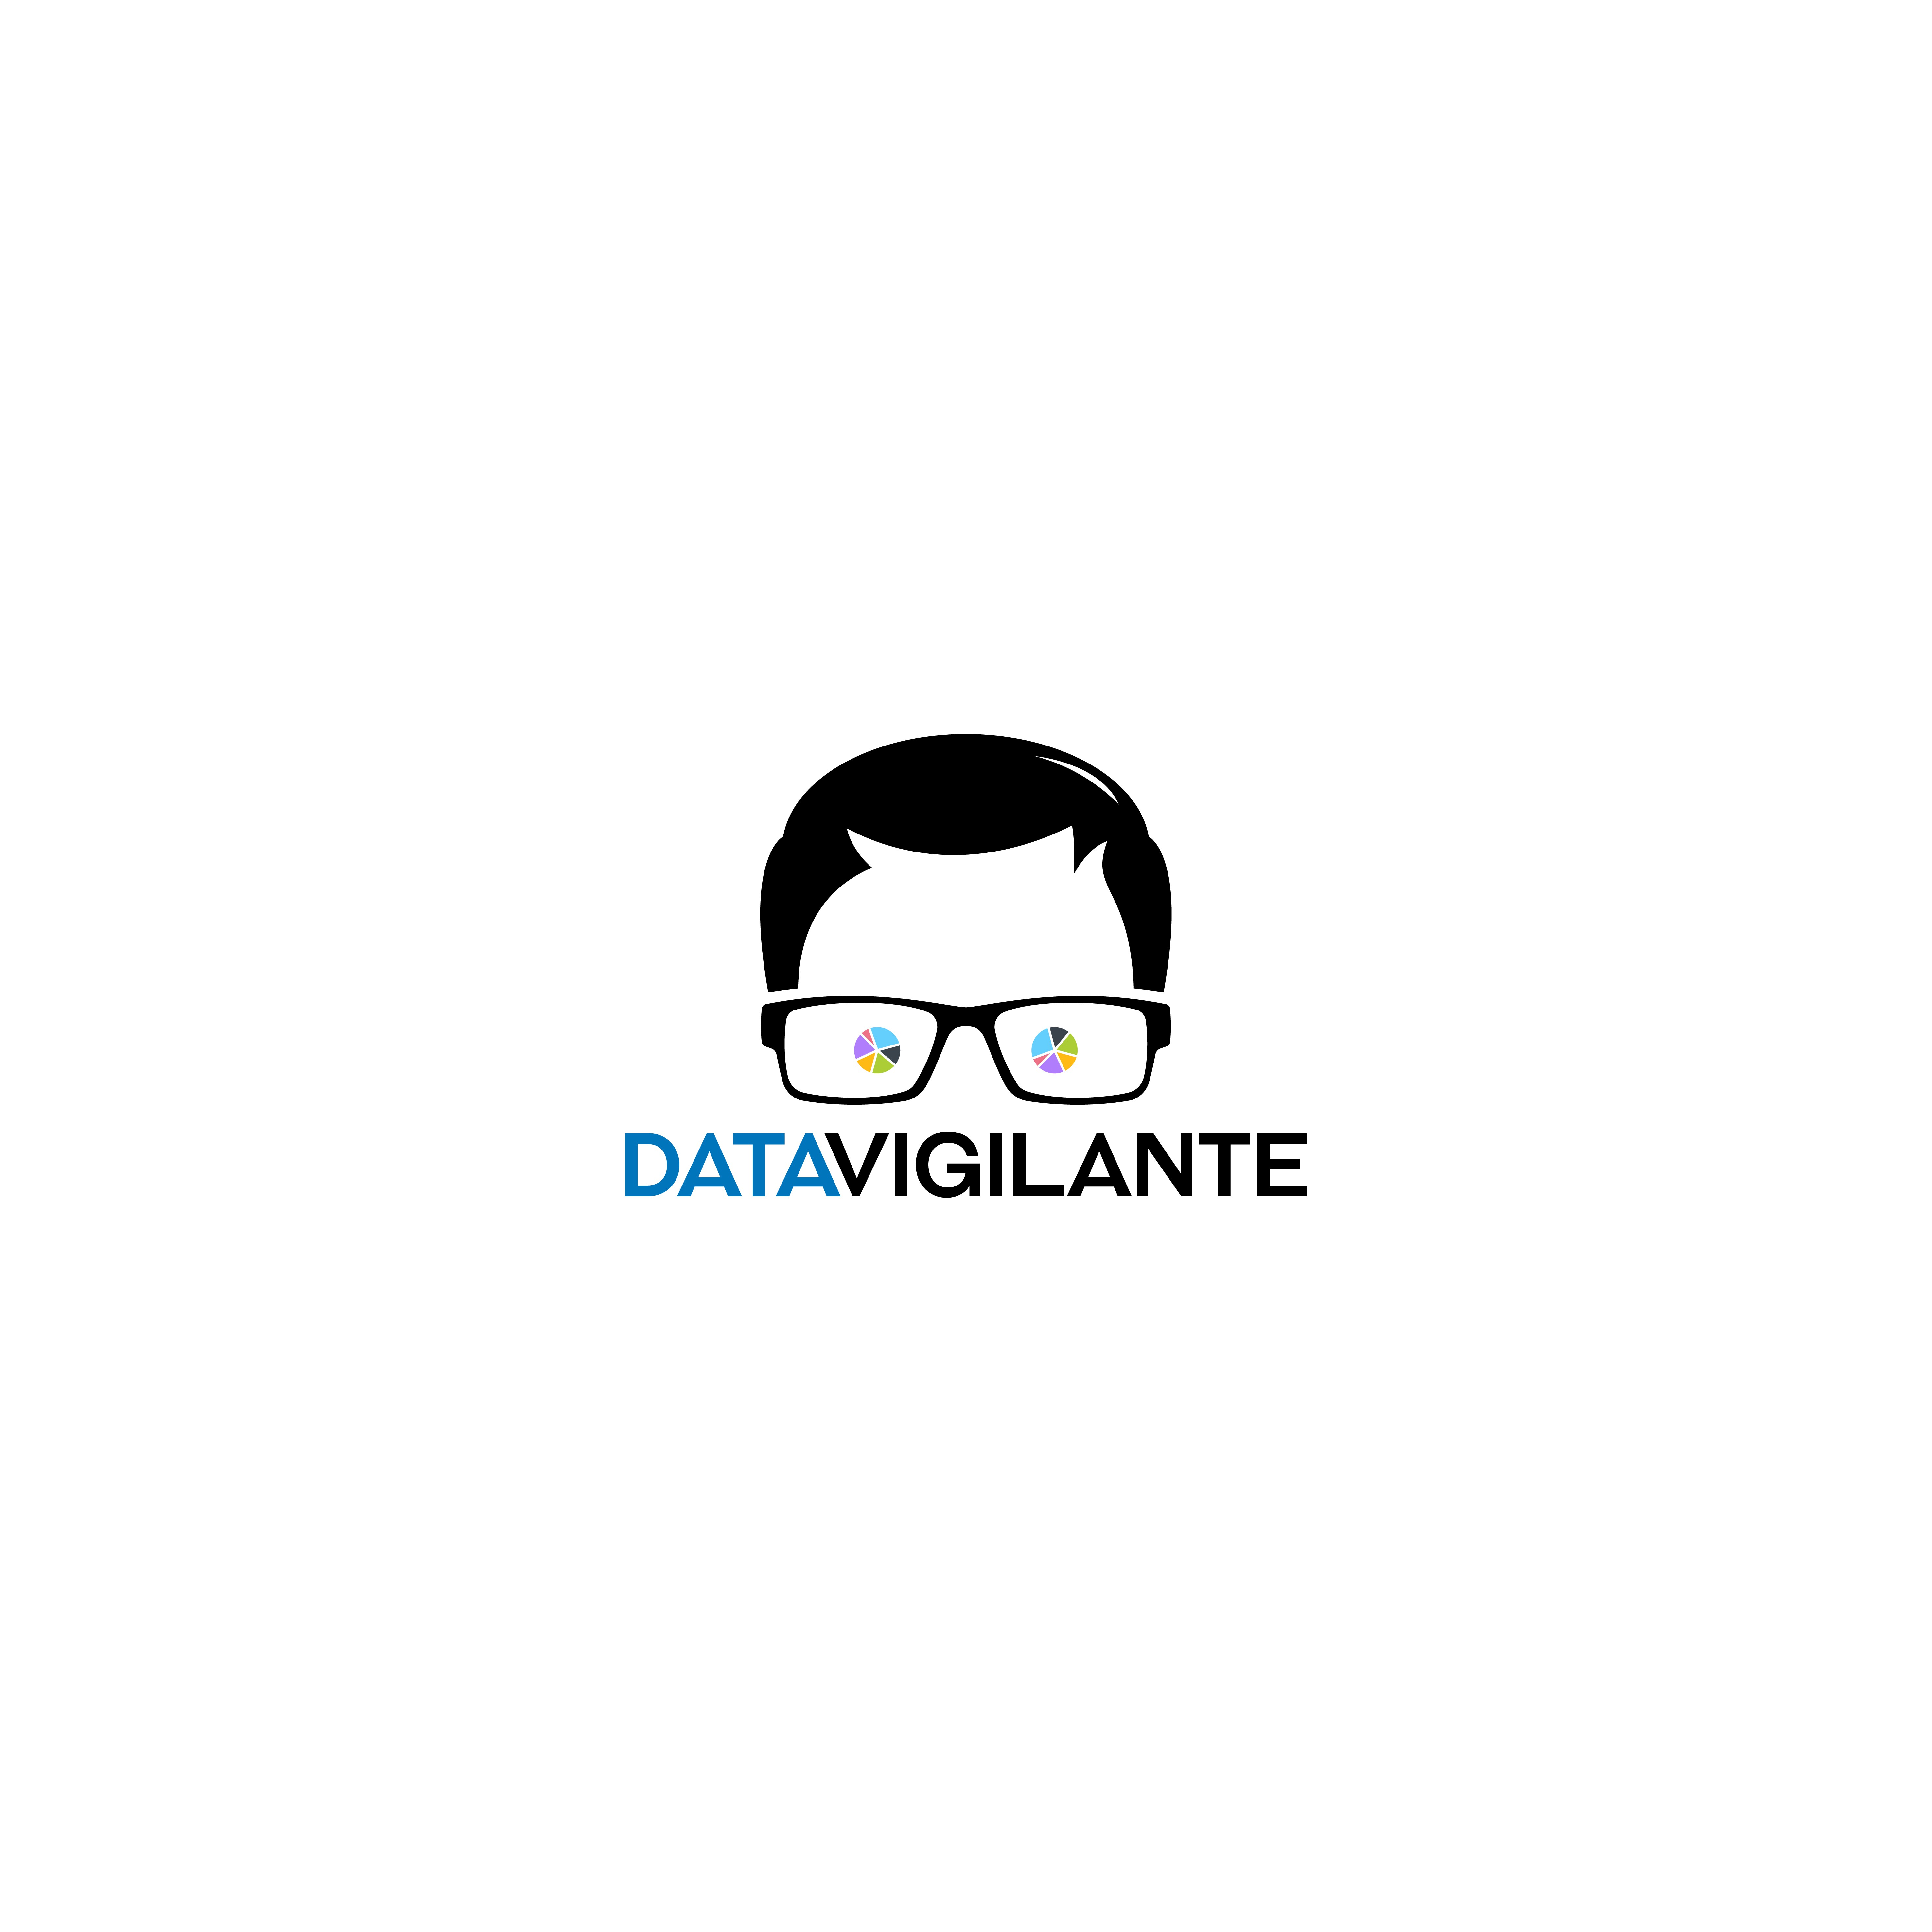 Data visualization freelancer seeks modern, professional, yet edgy logo